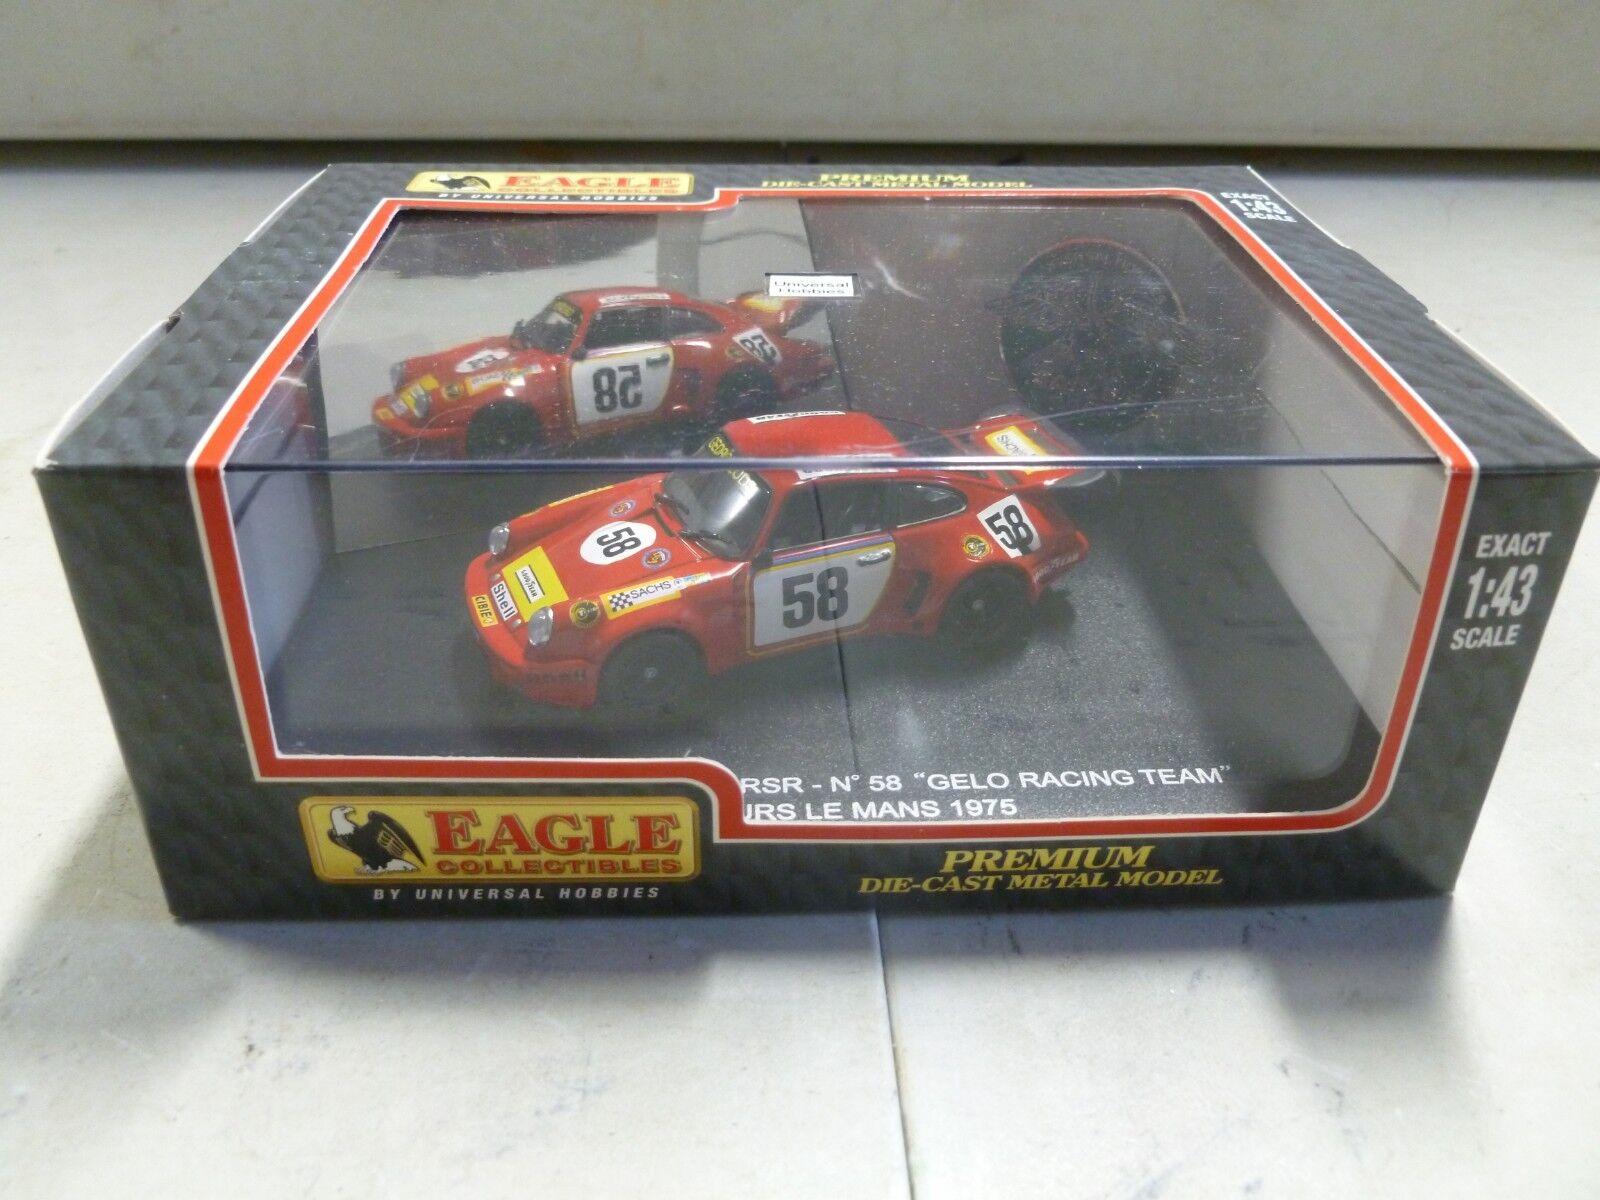 Eagle samlaives 1975 Porsche bilrera RSR 24 Hours Le Mans 1  43